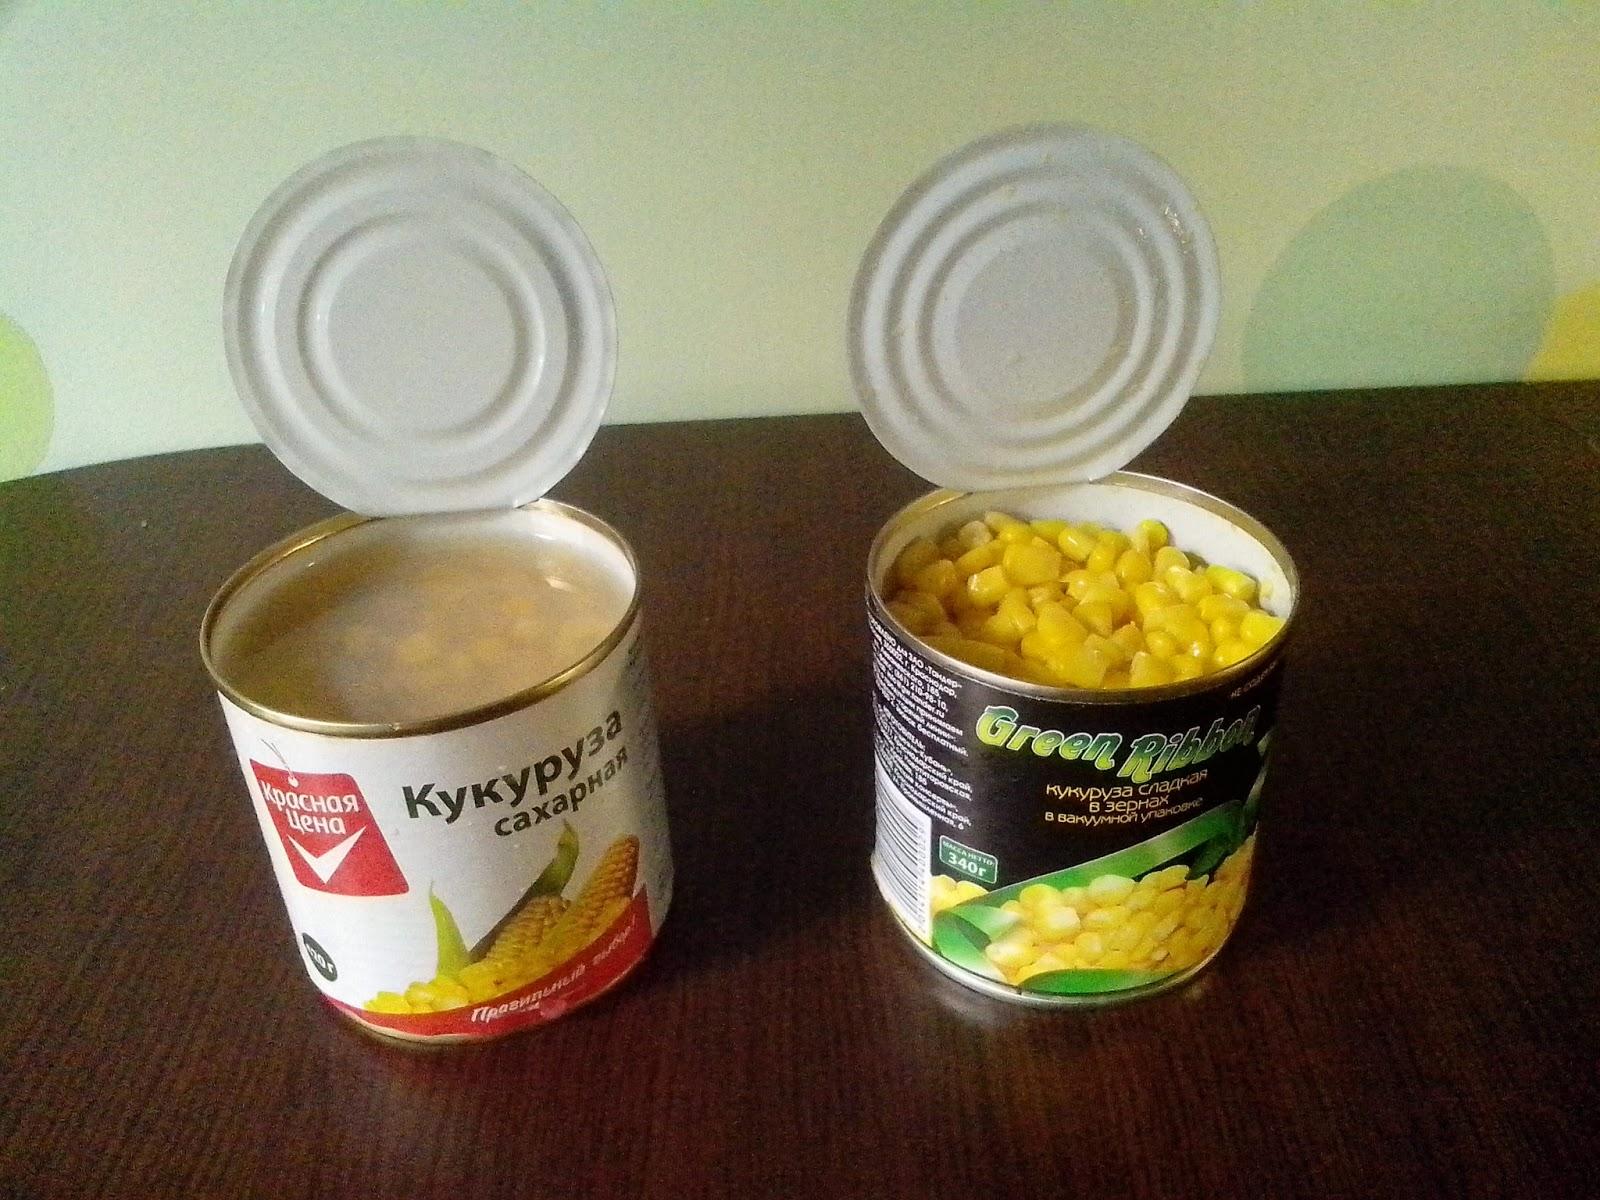 Konservirovannoj-kukuruzy-srok-godnosti1.jpg